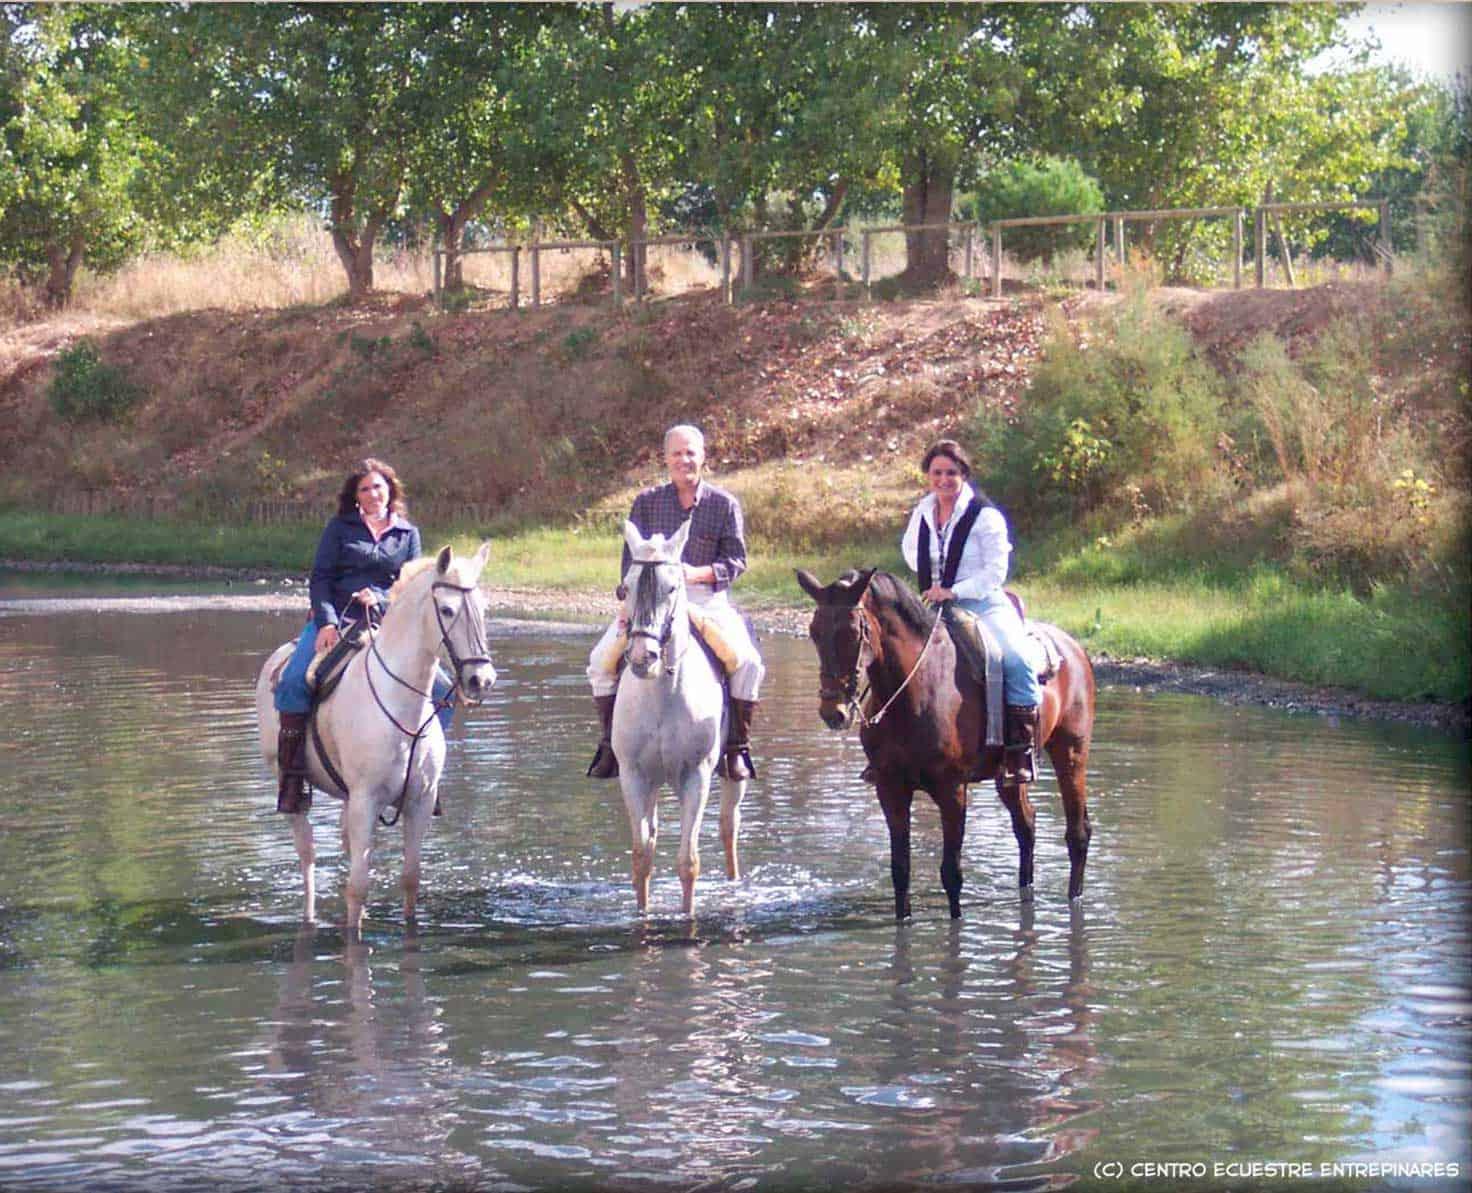 Paseo-a-caballo-por-el-rio-Guadiamar